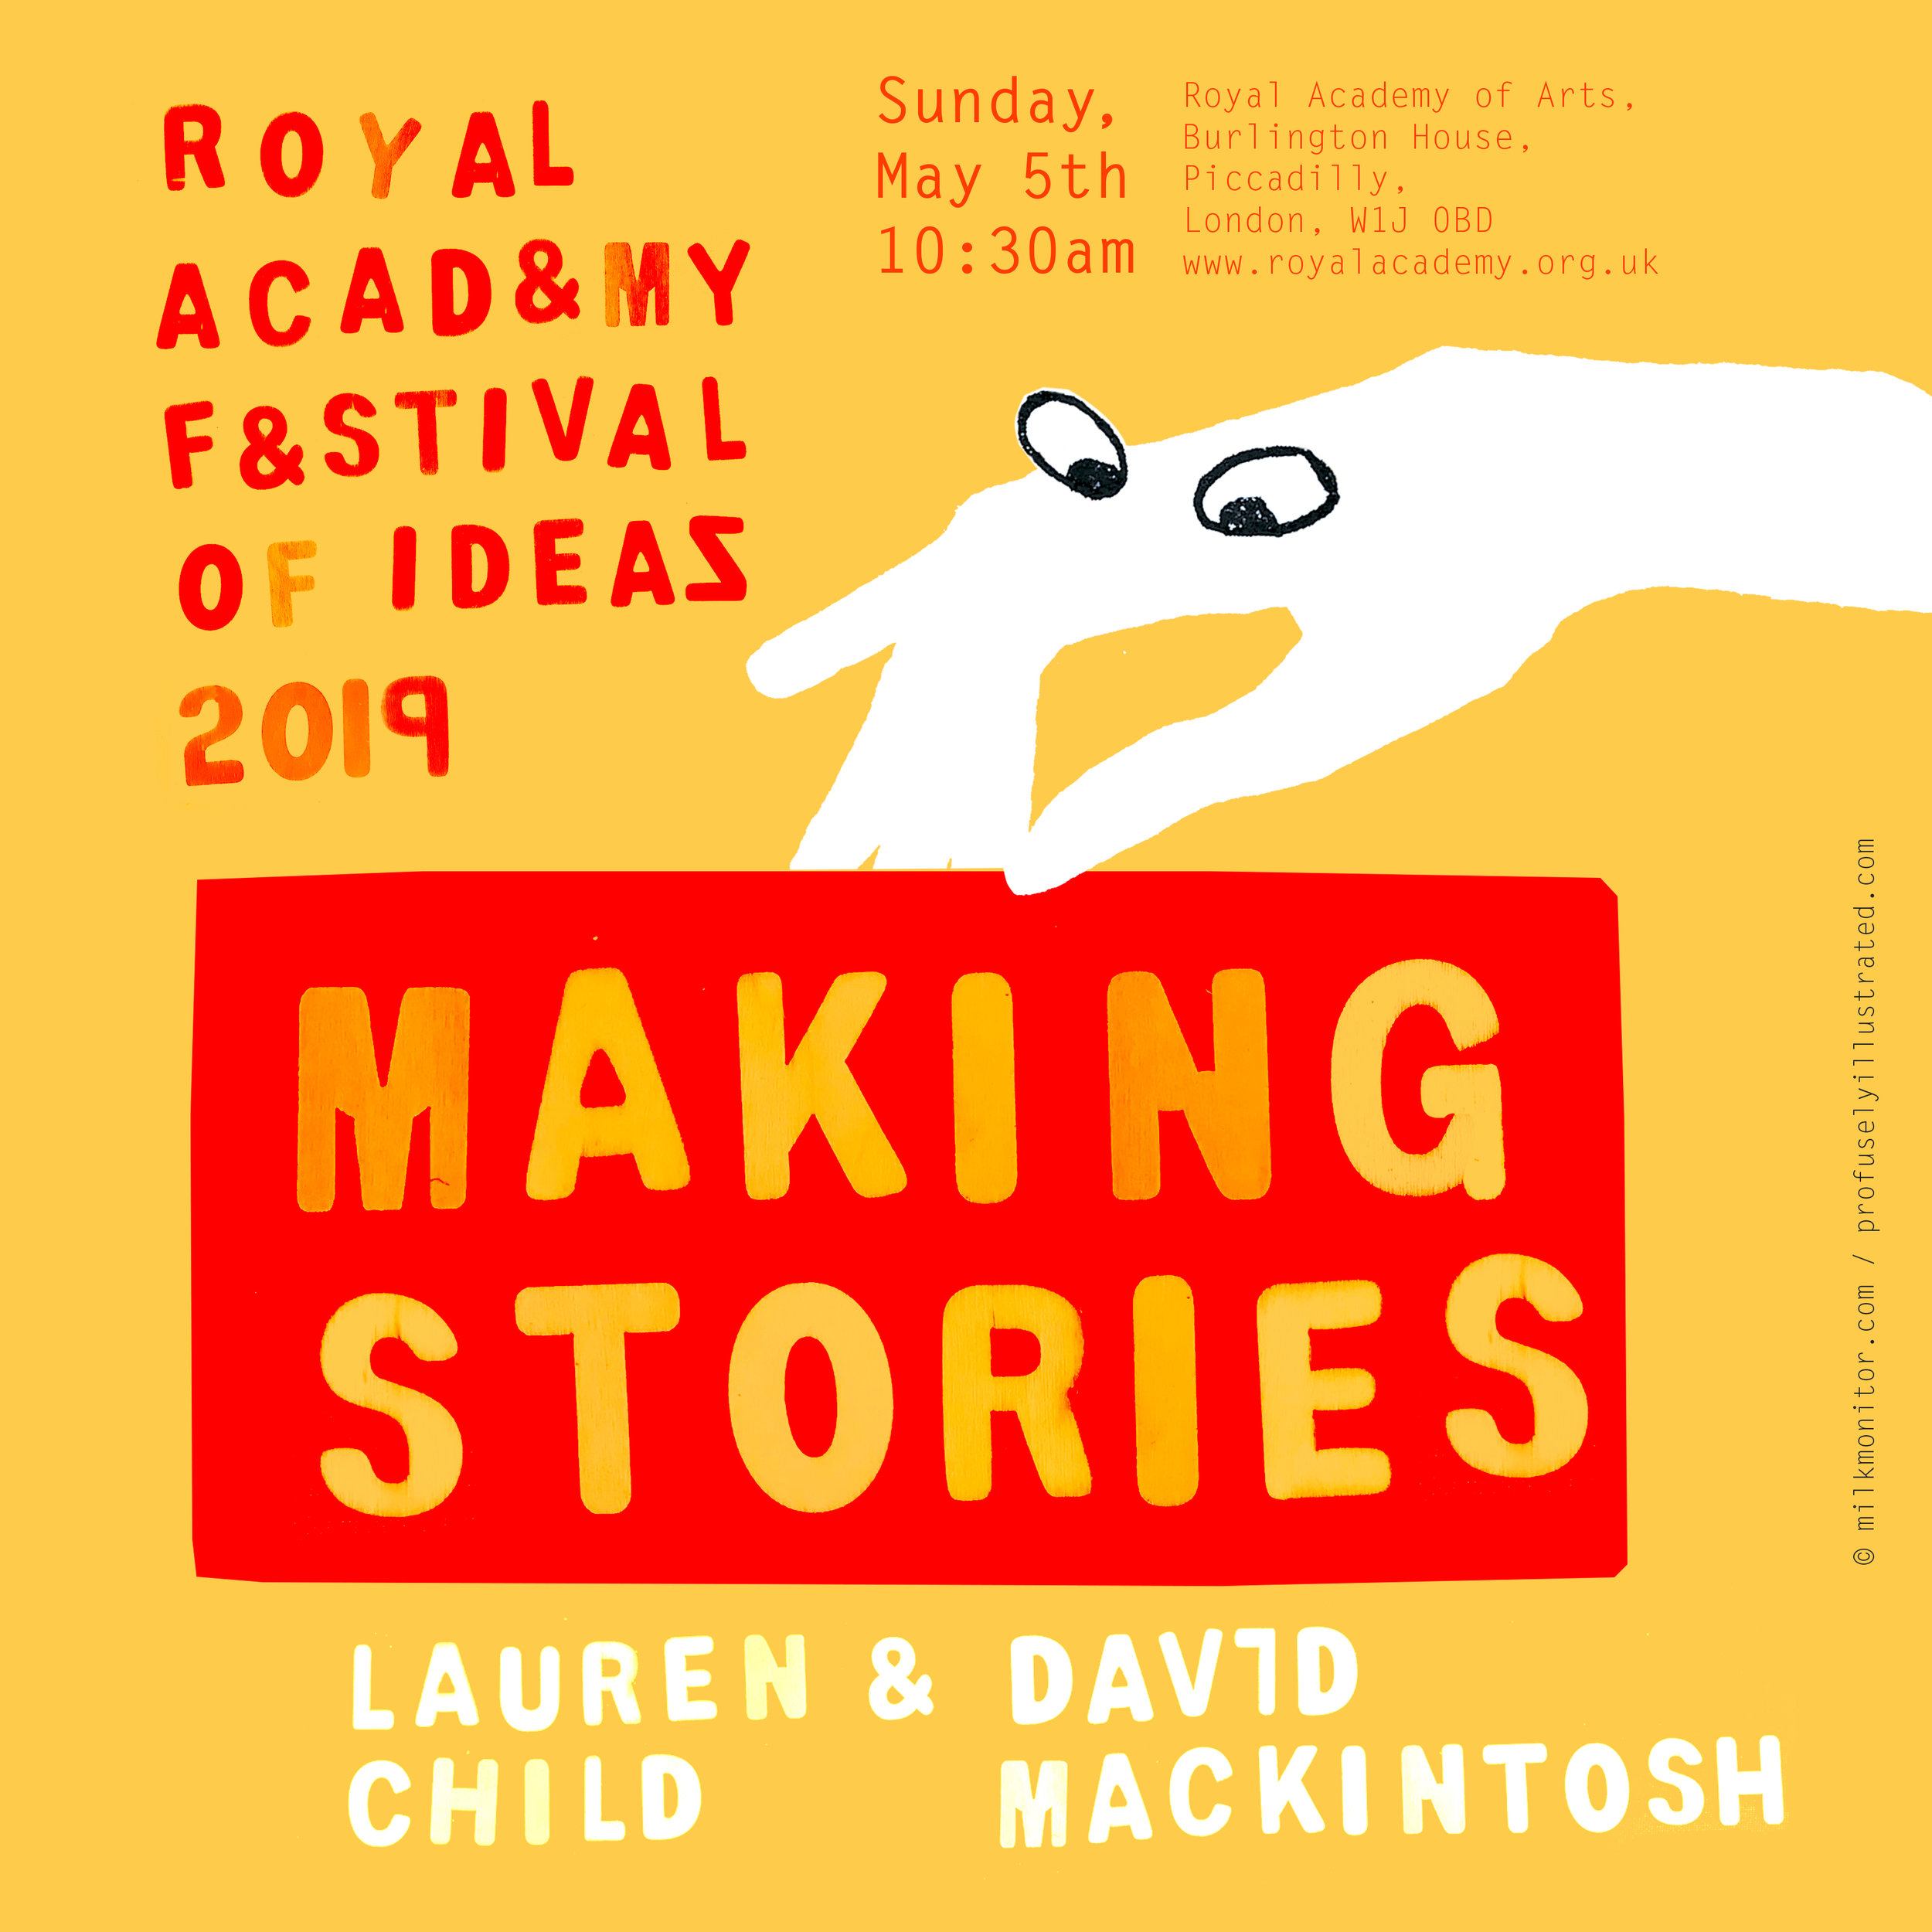 making stories RCA lauren child david mackintosh